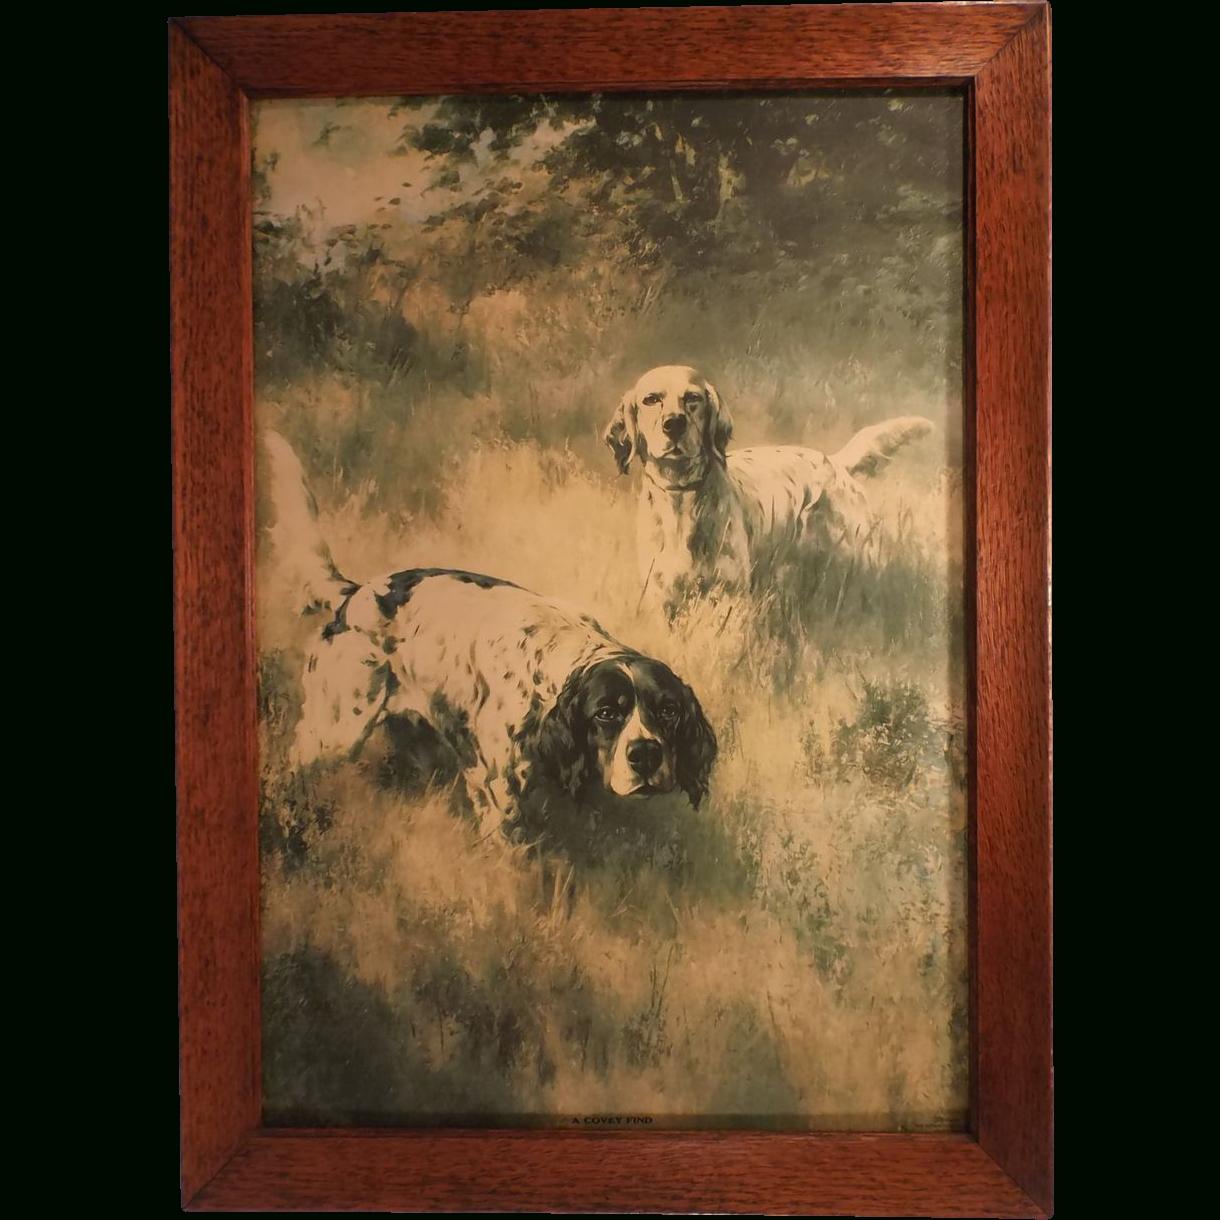 A Covey Find, Vintage Fine Art Framed Hunting Dog Print, Percival In Recent Dog Art Framed Prints (View 2 of 15)